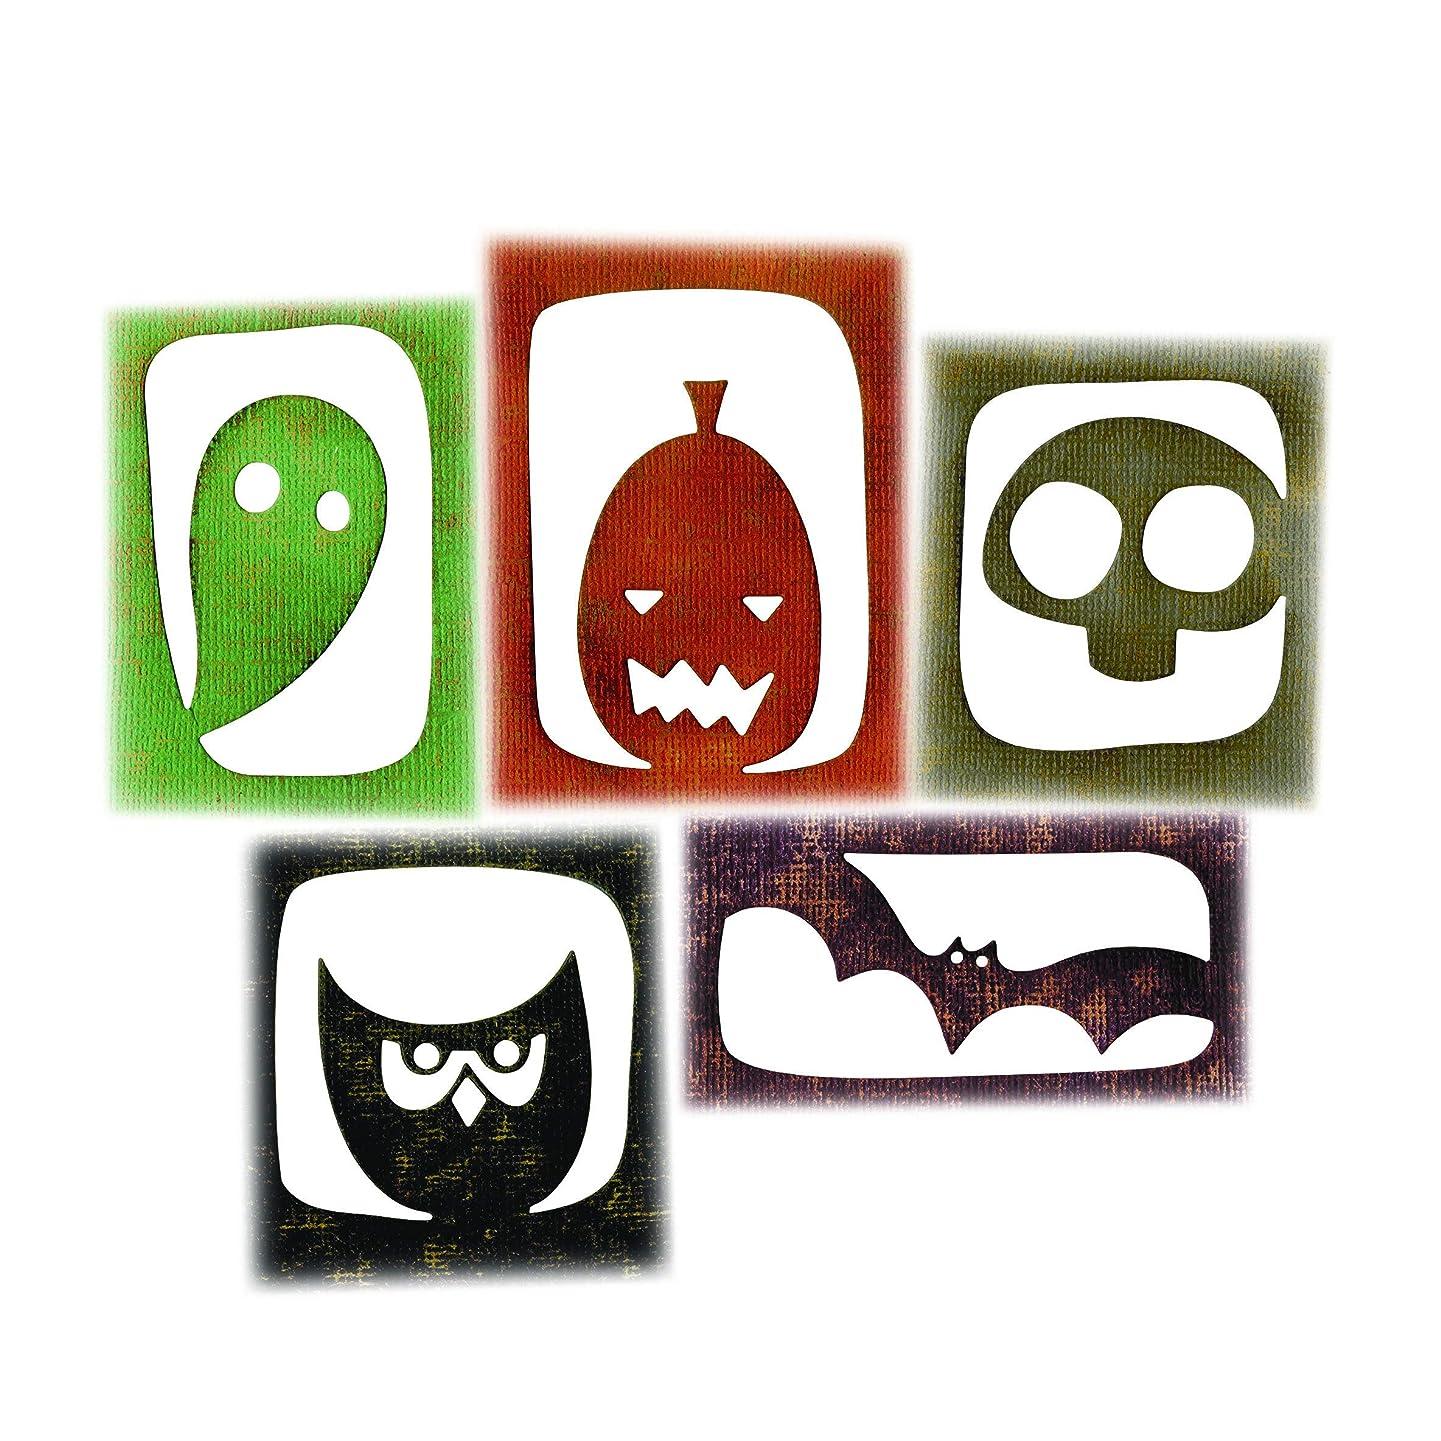 Sizzix 663088 Thinlits Dies Halloween Hangouts by Tim Holtz, 5-Pack, One Size, Multicolor qsgjiozrjsva